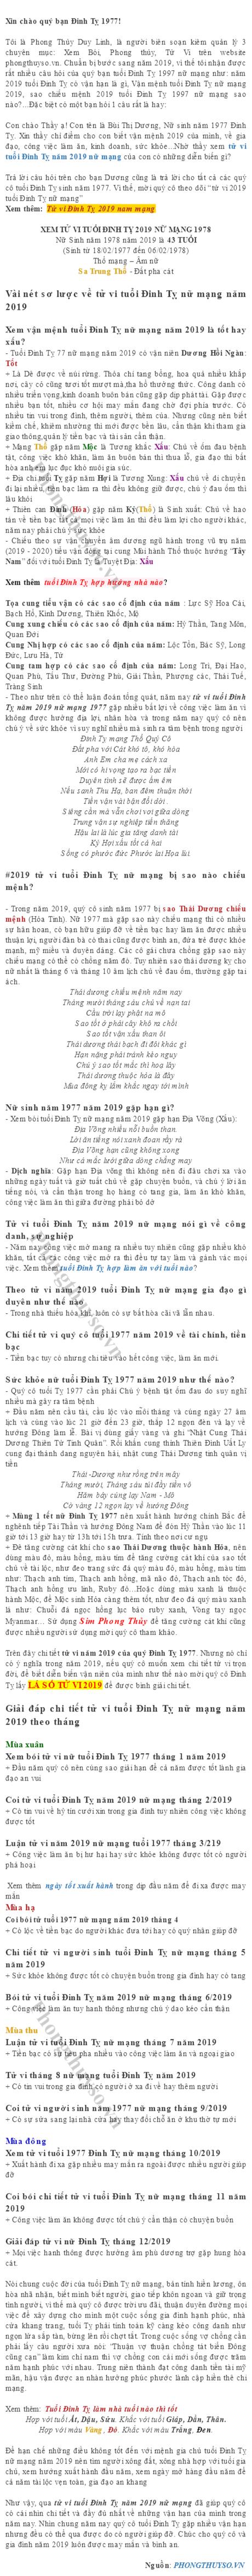 tu-vi-tuoi-dinh-ty-nam-2019-nu-mang